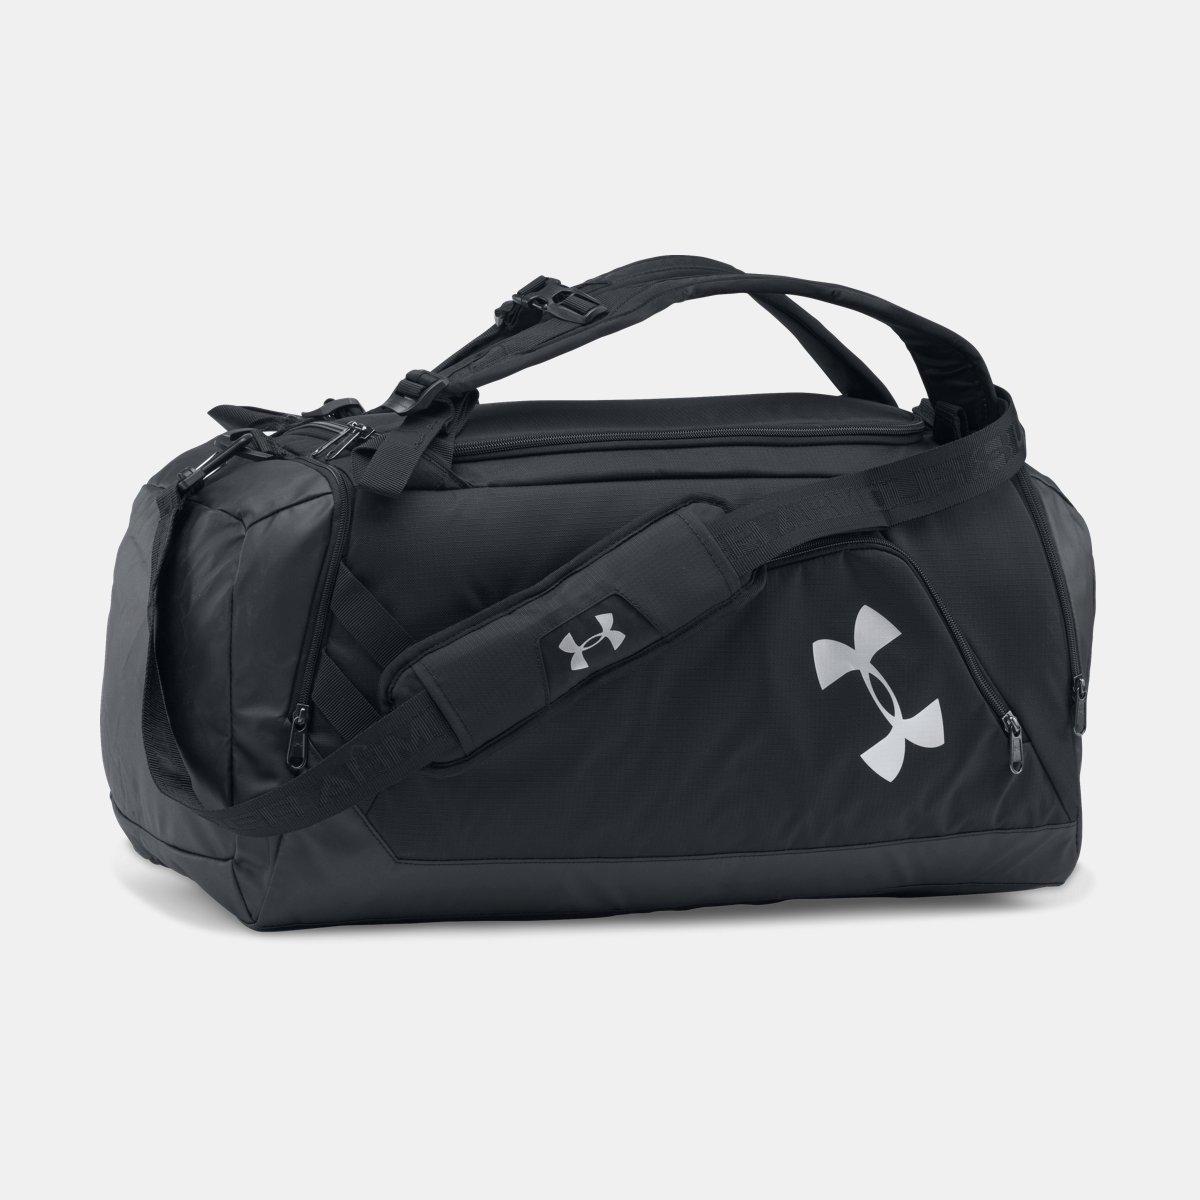 [UNDER ARMOUR] アンダーアーマー UA Storm Contain Backpack Duffle 3.0 [並行輸入品]  Black /Black B0753C2QM3